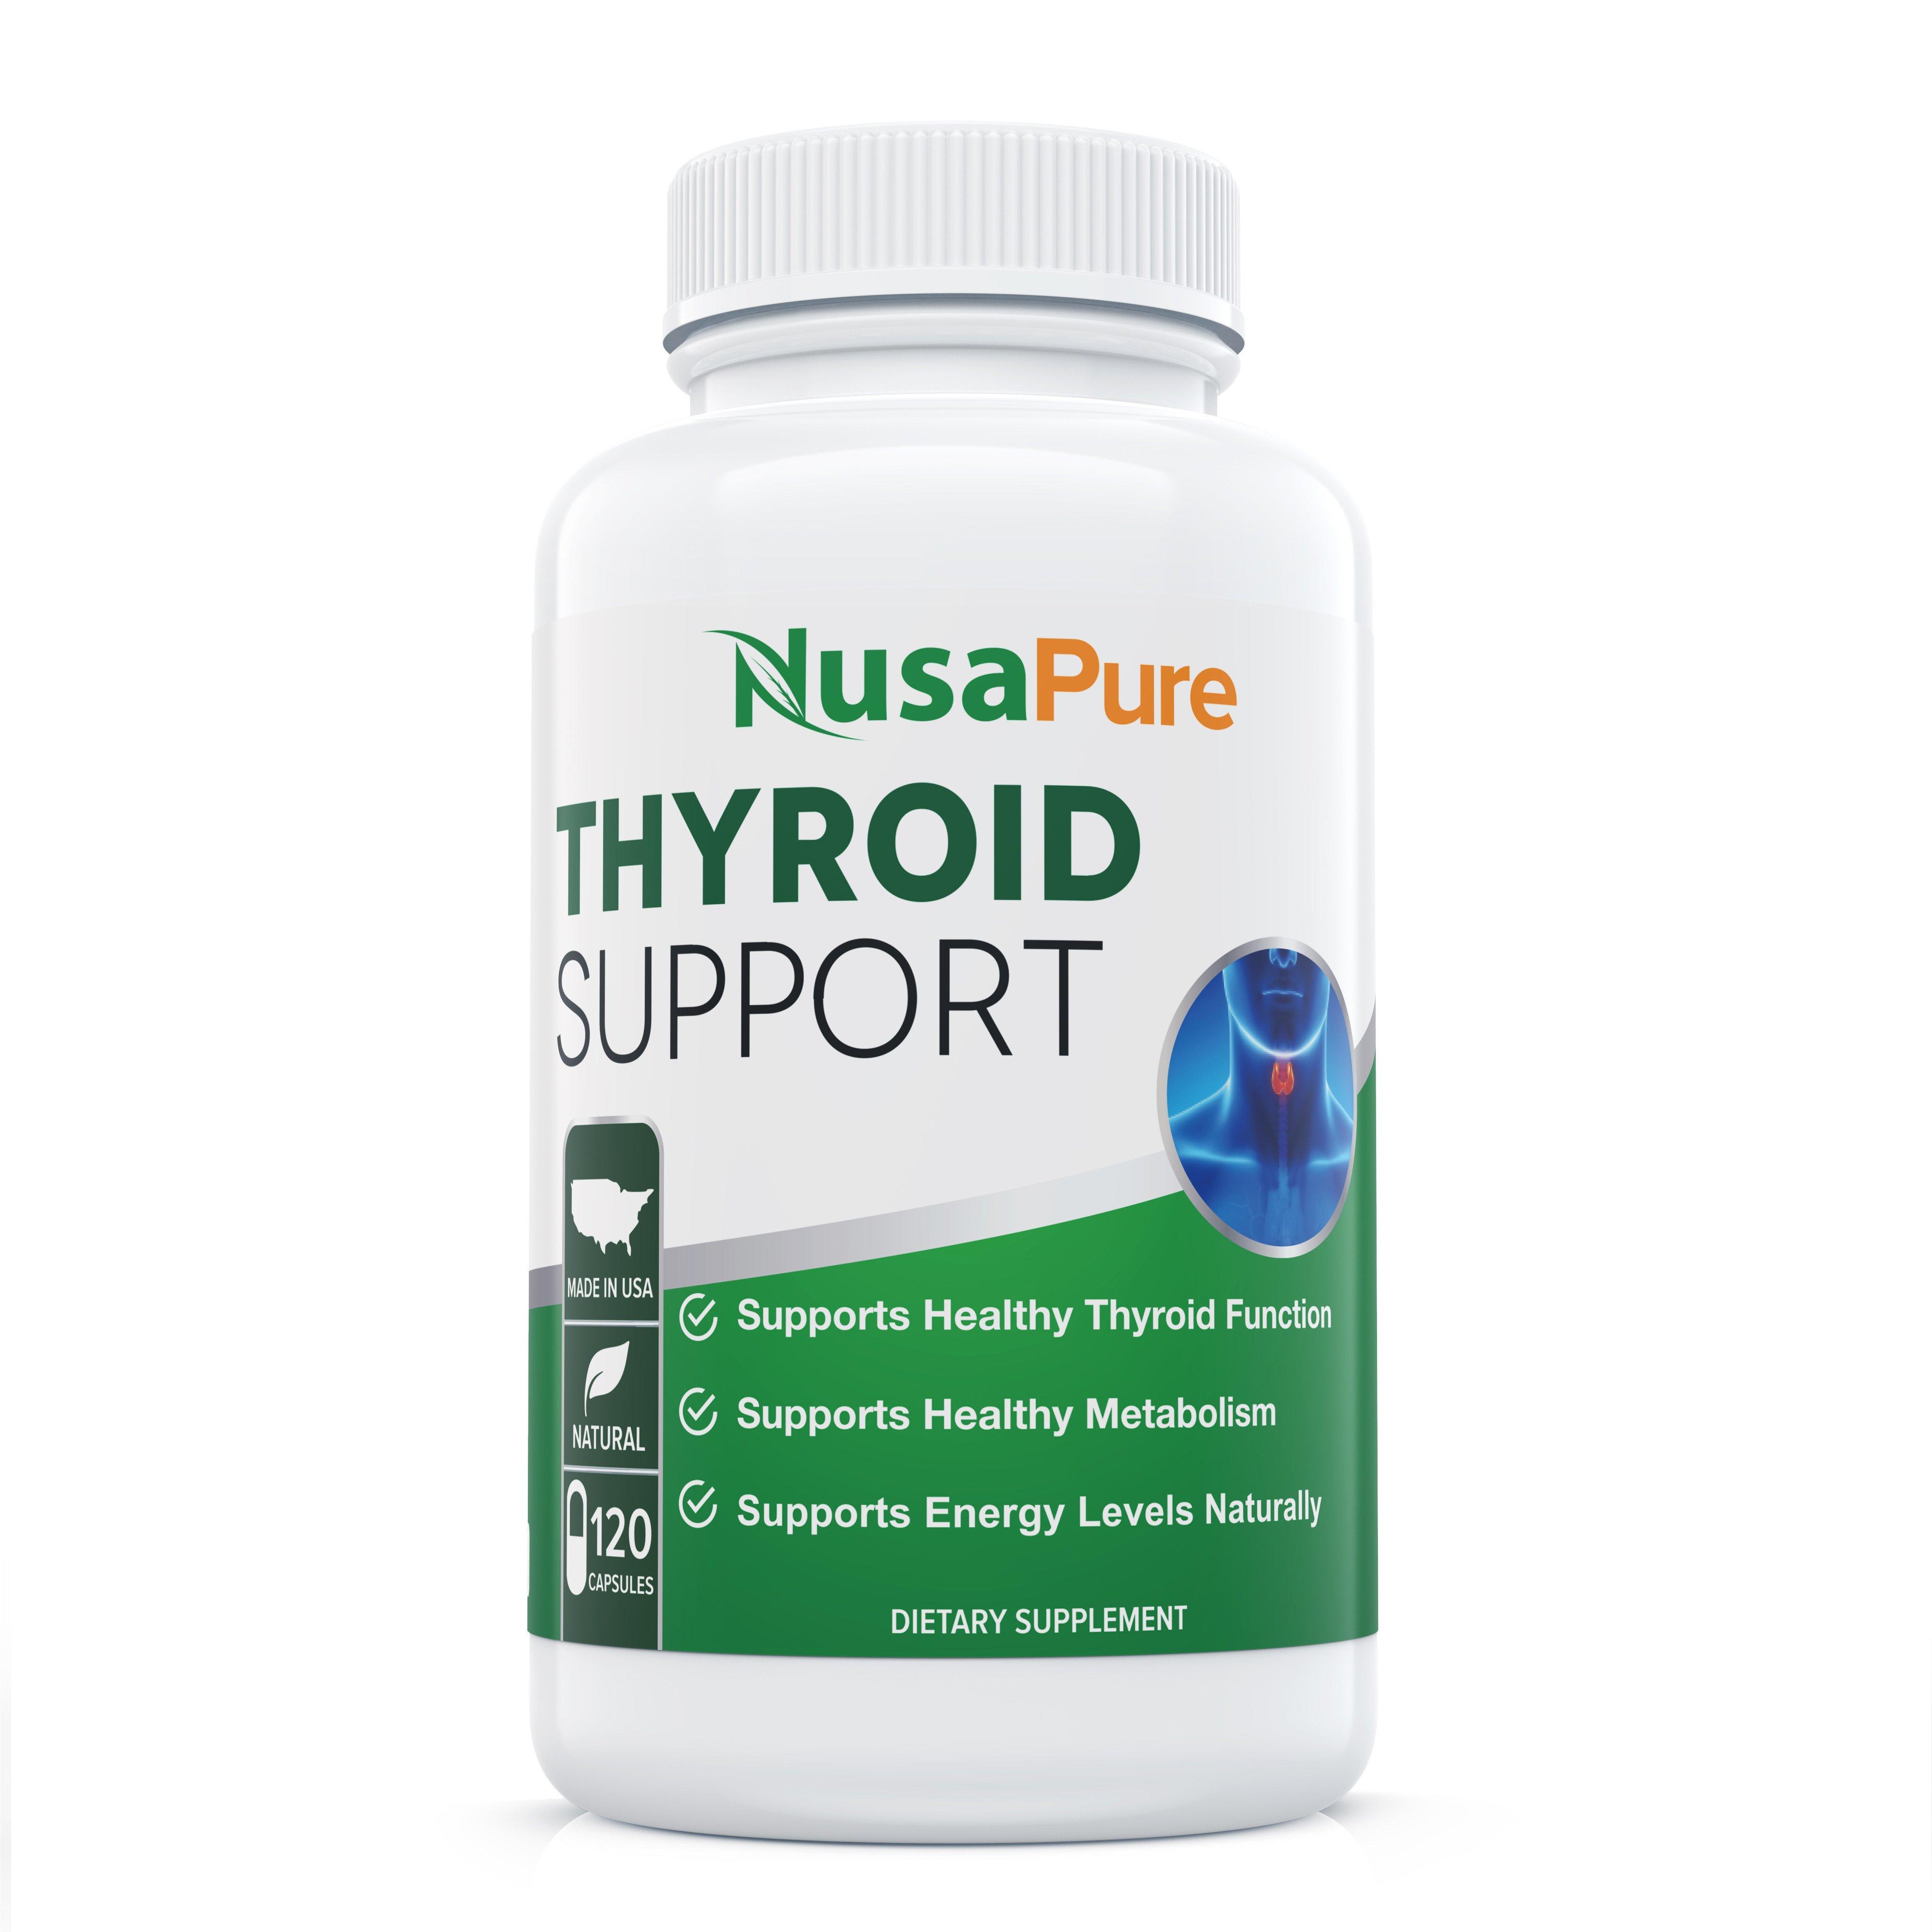 Thyroid Support  - 120 Caps ( Non-GMO) with Ashwaganda, Iodine, Zinc, T3 Supplement, Kelp, Vitamin B12